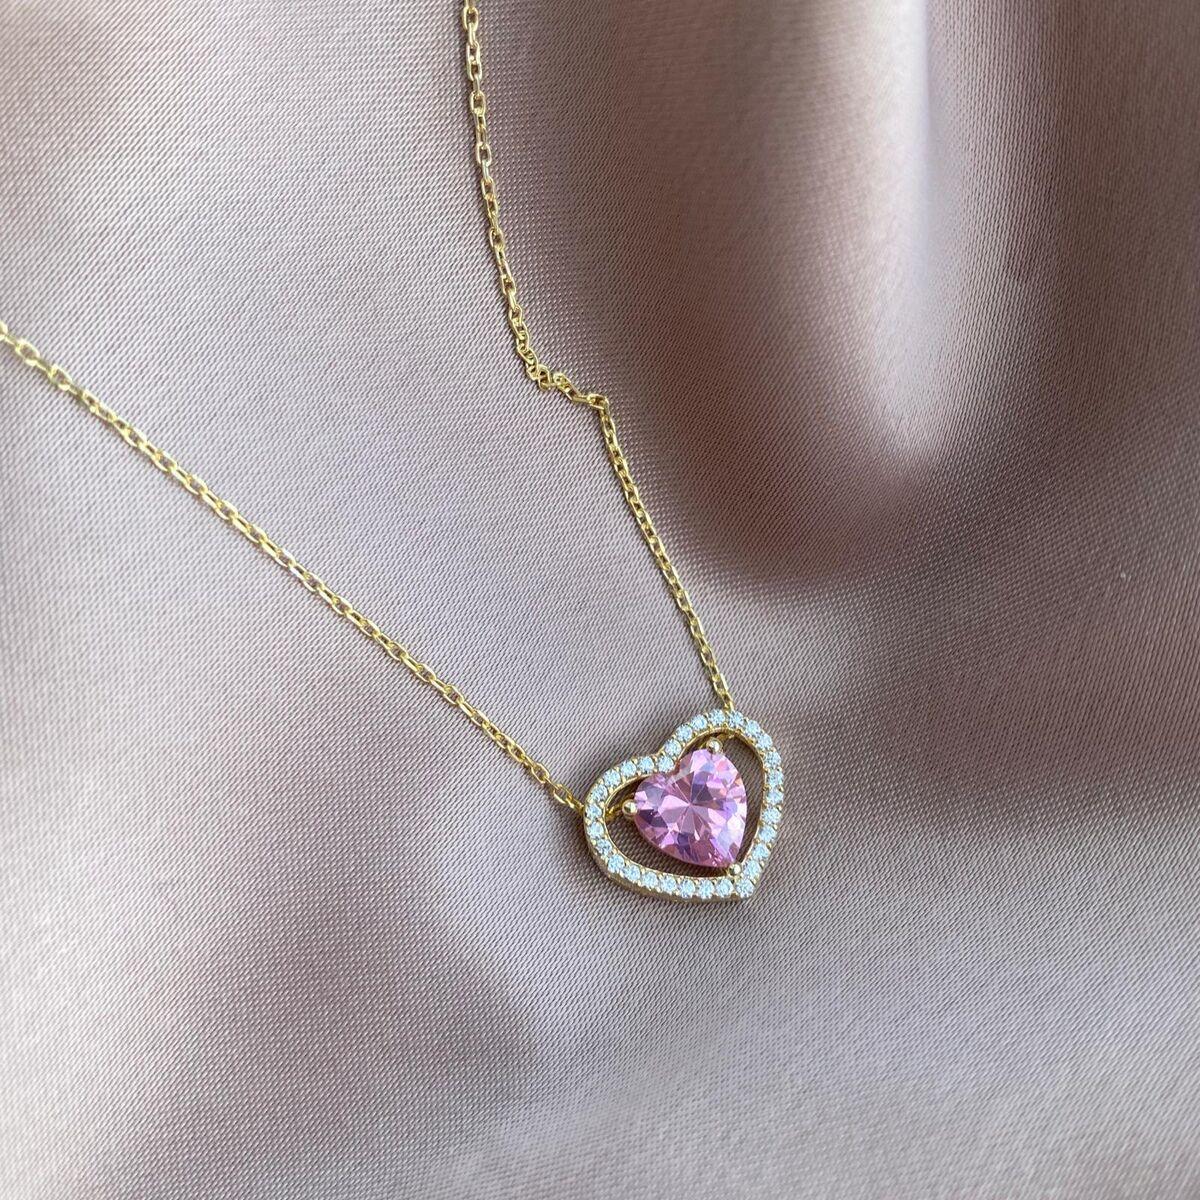 Pembe Taşlı Çift Uçlu Kalp Kolye | 925 Gümüş